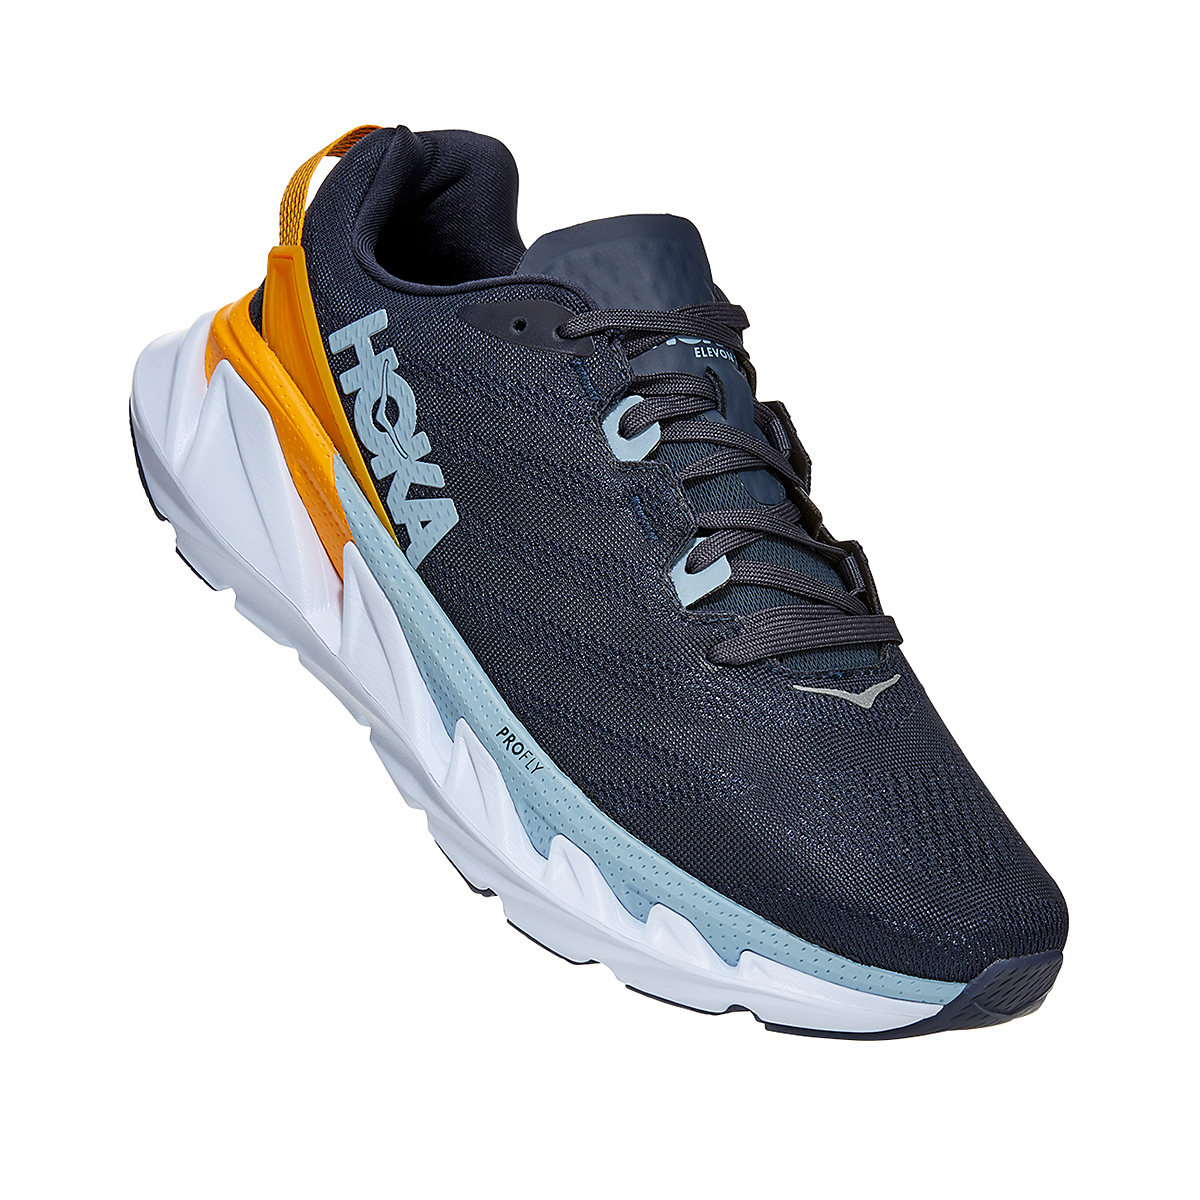 Men's Hoka One One Elevon 2 Running Shoe - Color: Ombre Blue - Size: 7 - Width: Regular, Ombre Blue, large, image 3